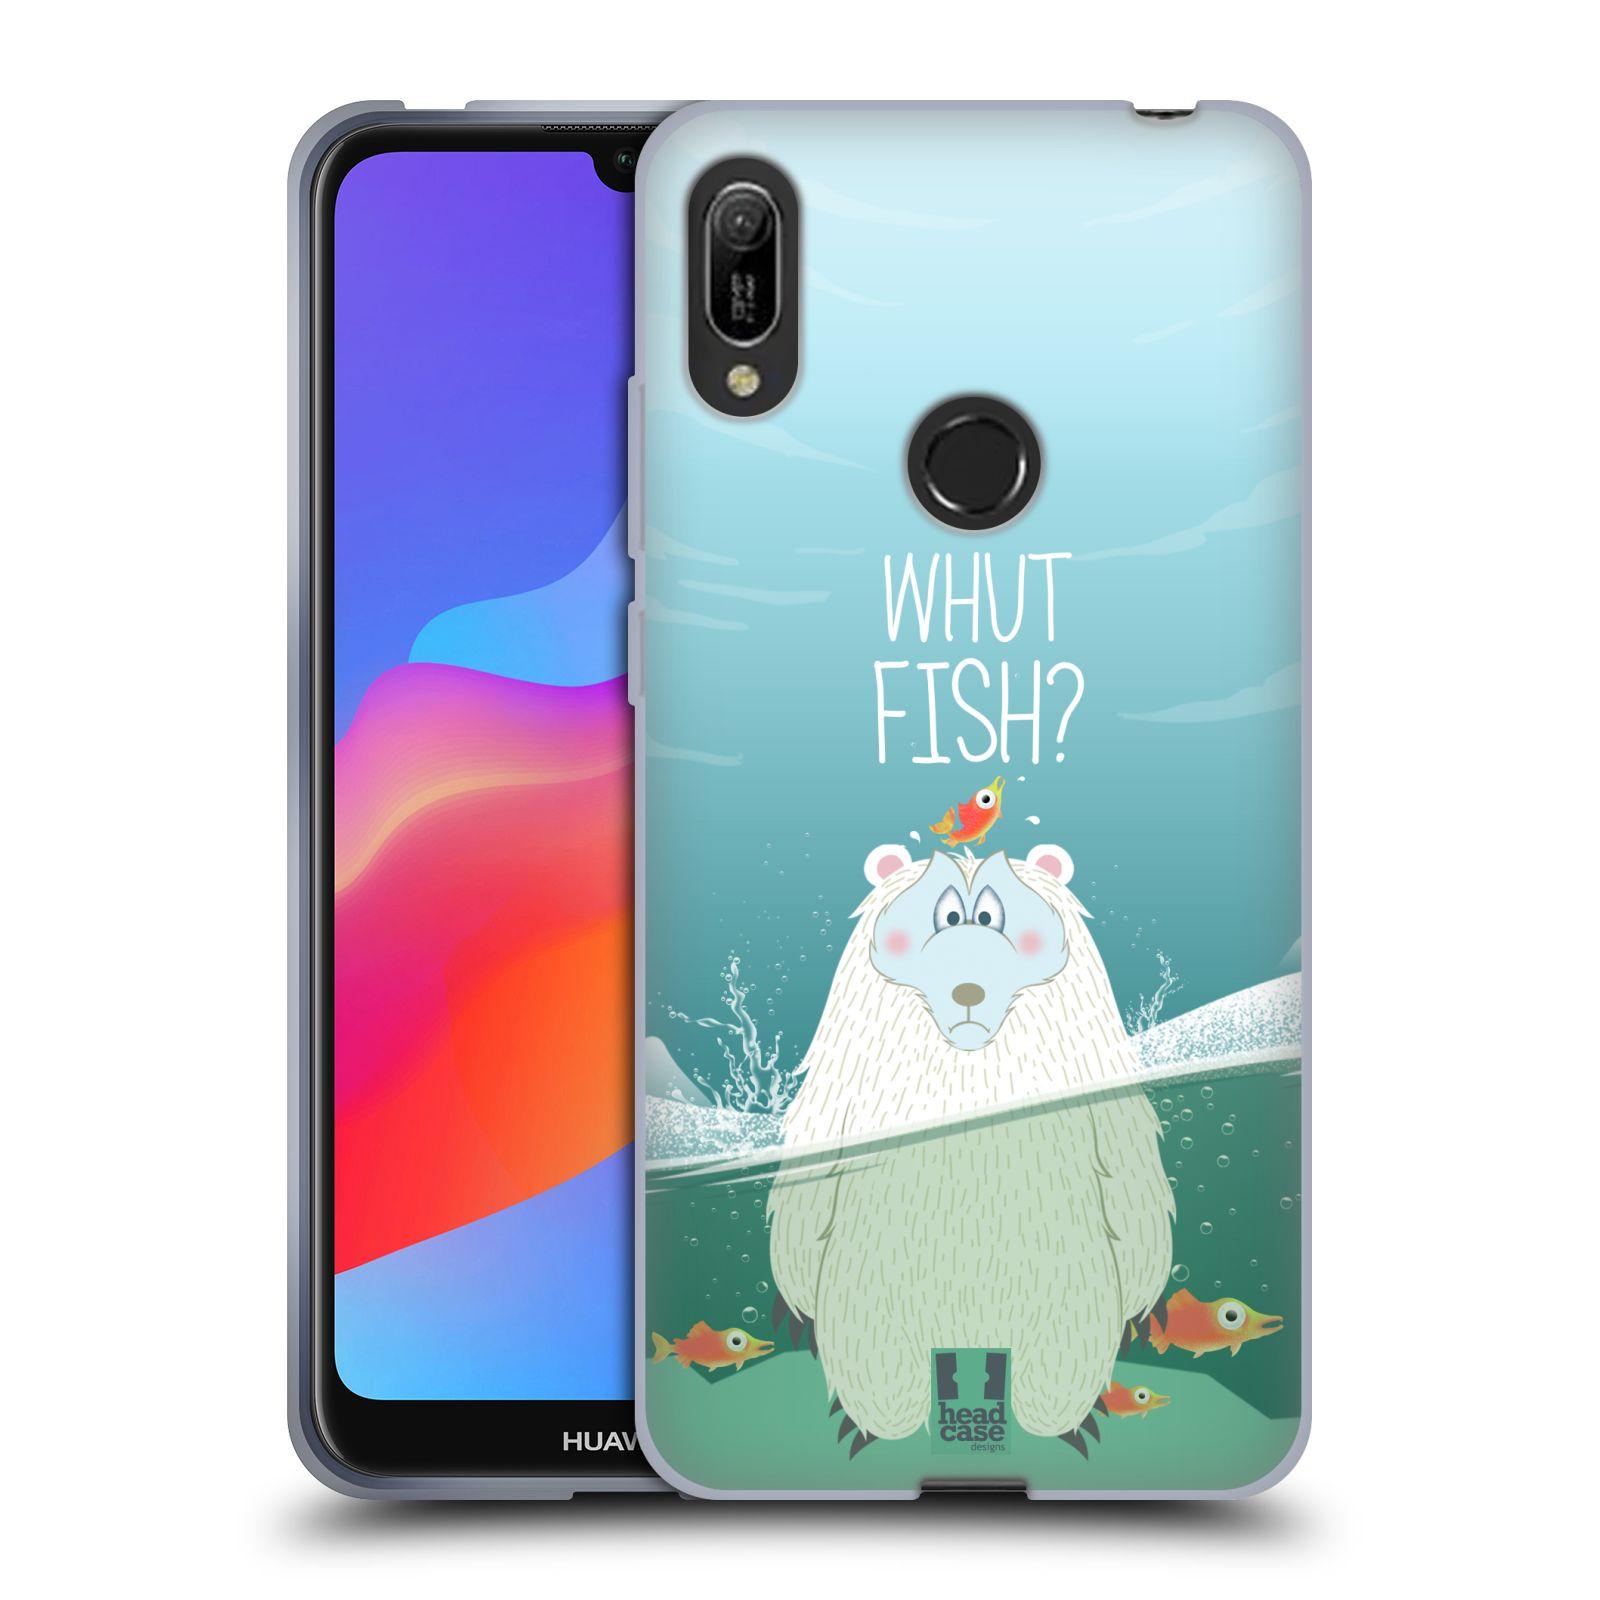 Silikonové pouzdro na mobil Huawei Y6 (2019) - Head Case - Medvěd Whut Fish?